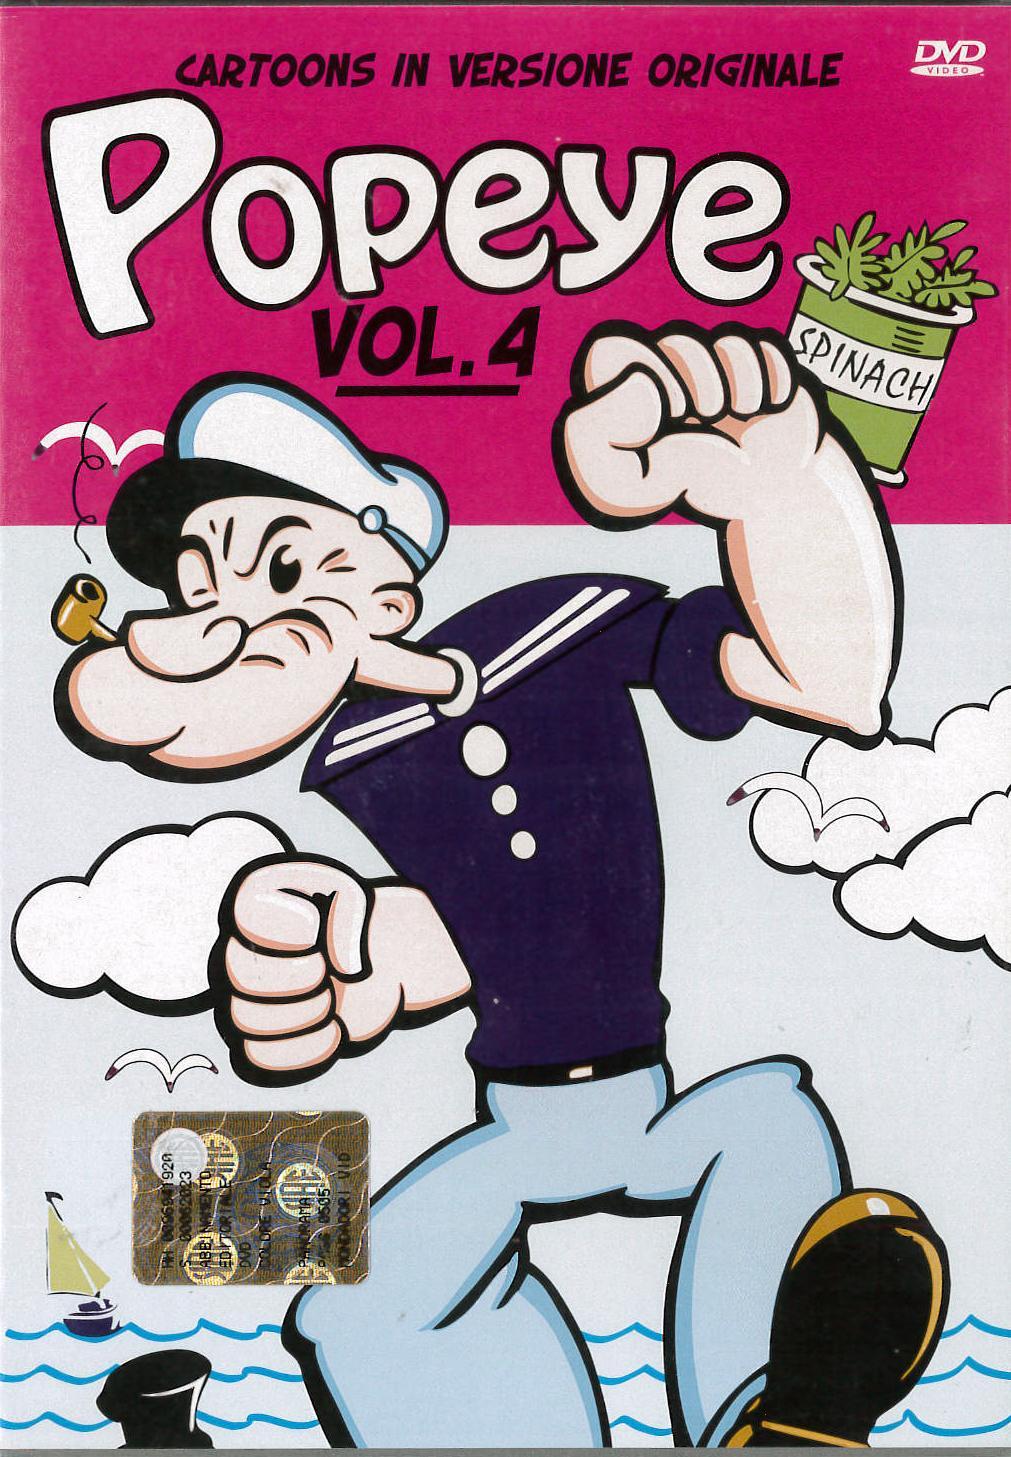 POPEYE VOL.4 (DVD)